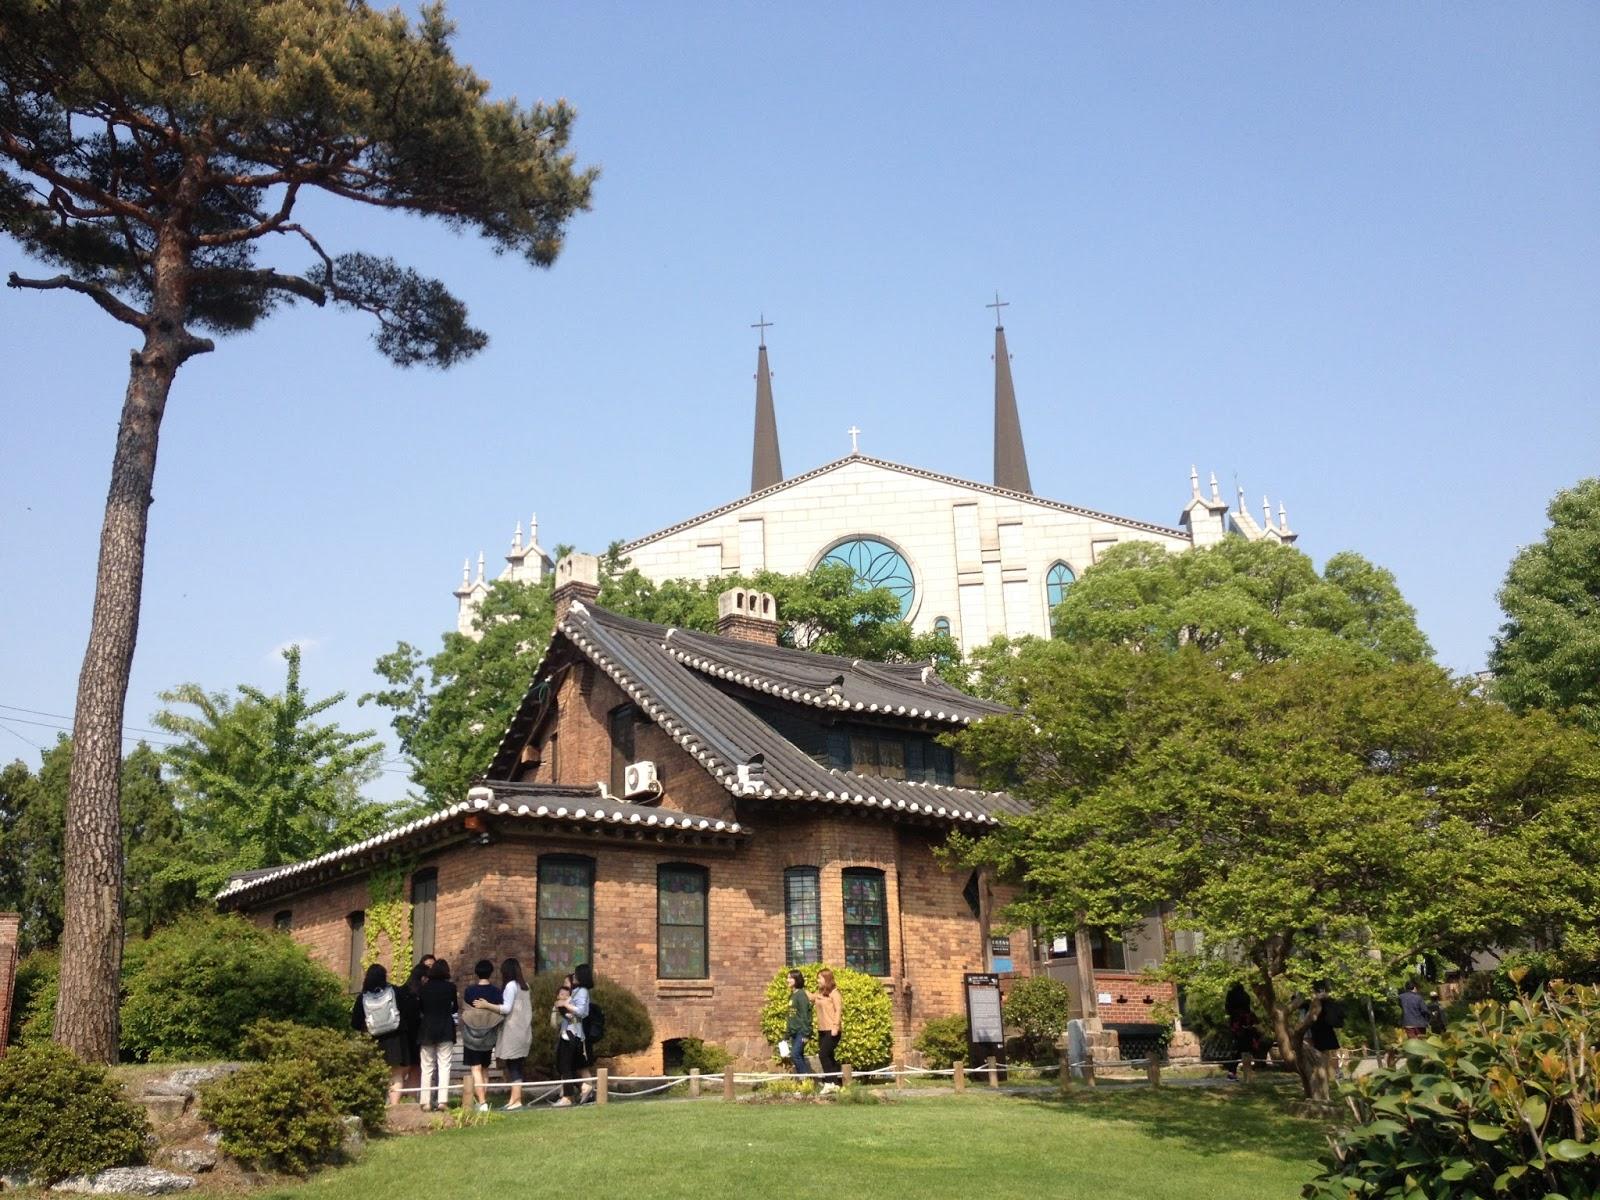 History of Daegu